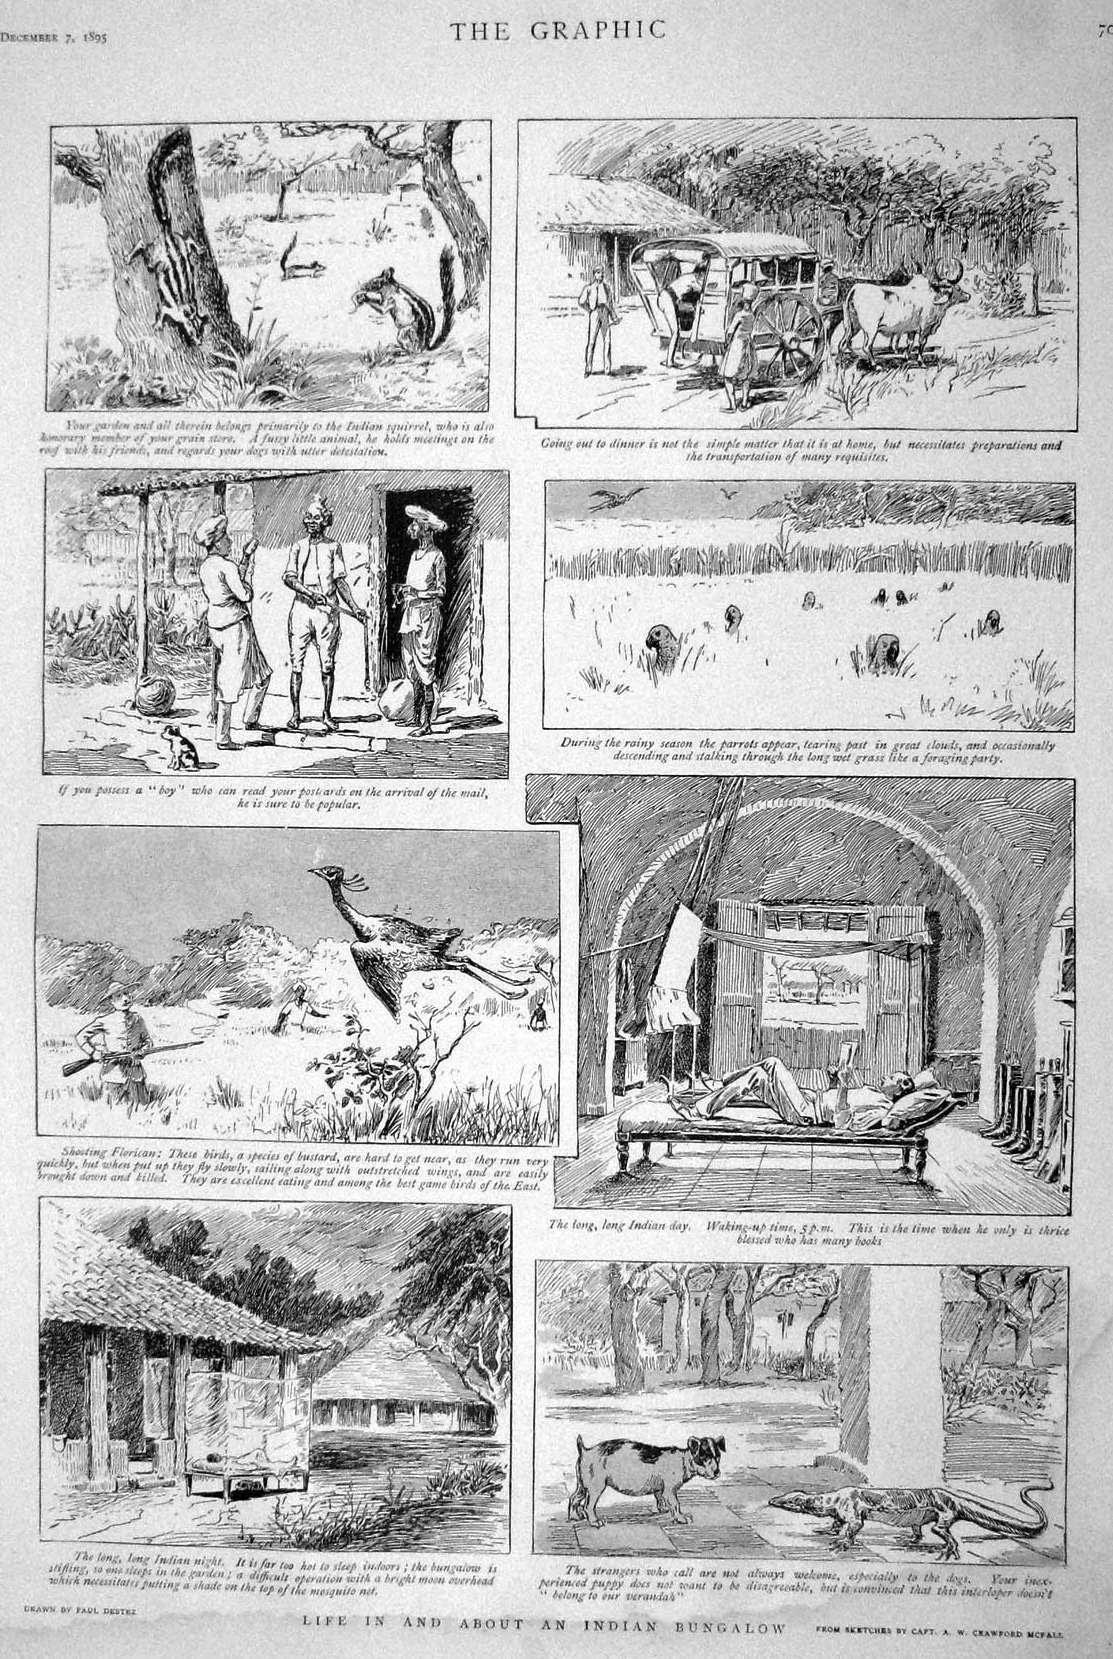 http://www.columbia.edu/itc/mealac/pritchett/00routesdata/1800_1899/britishrule/incountry/graphic1895.jpg